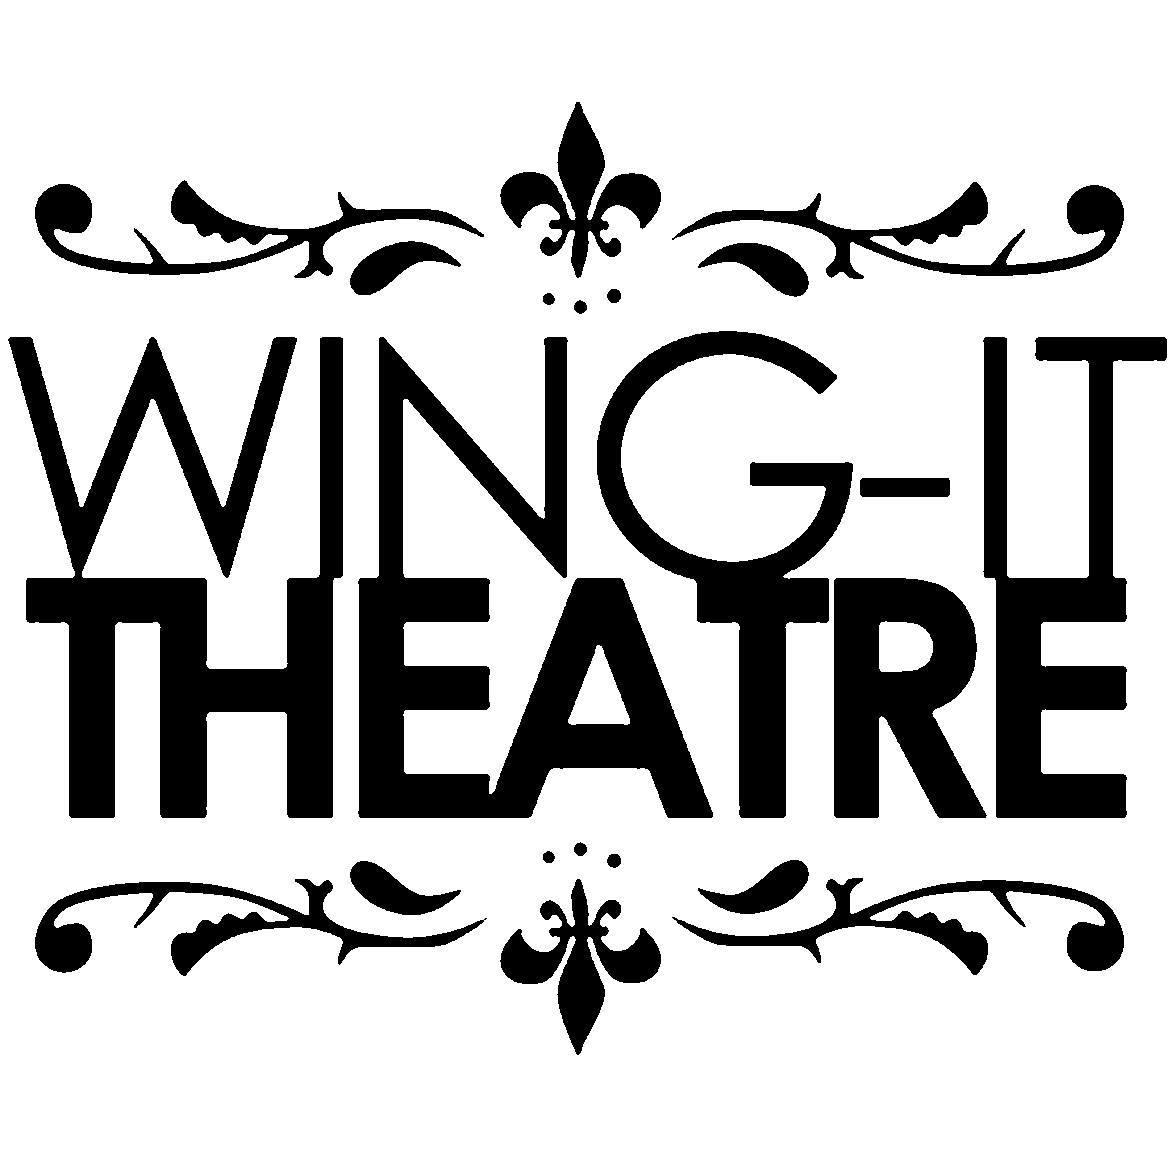 Wing-it Theatre